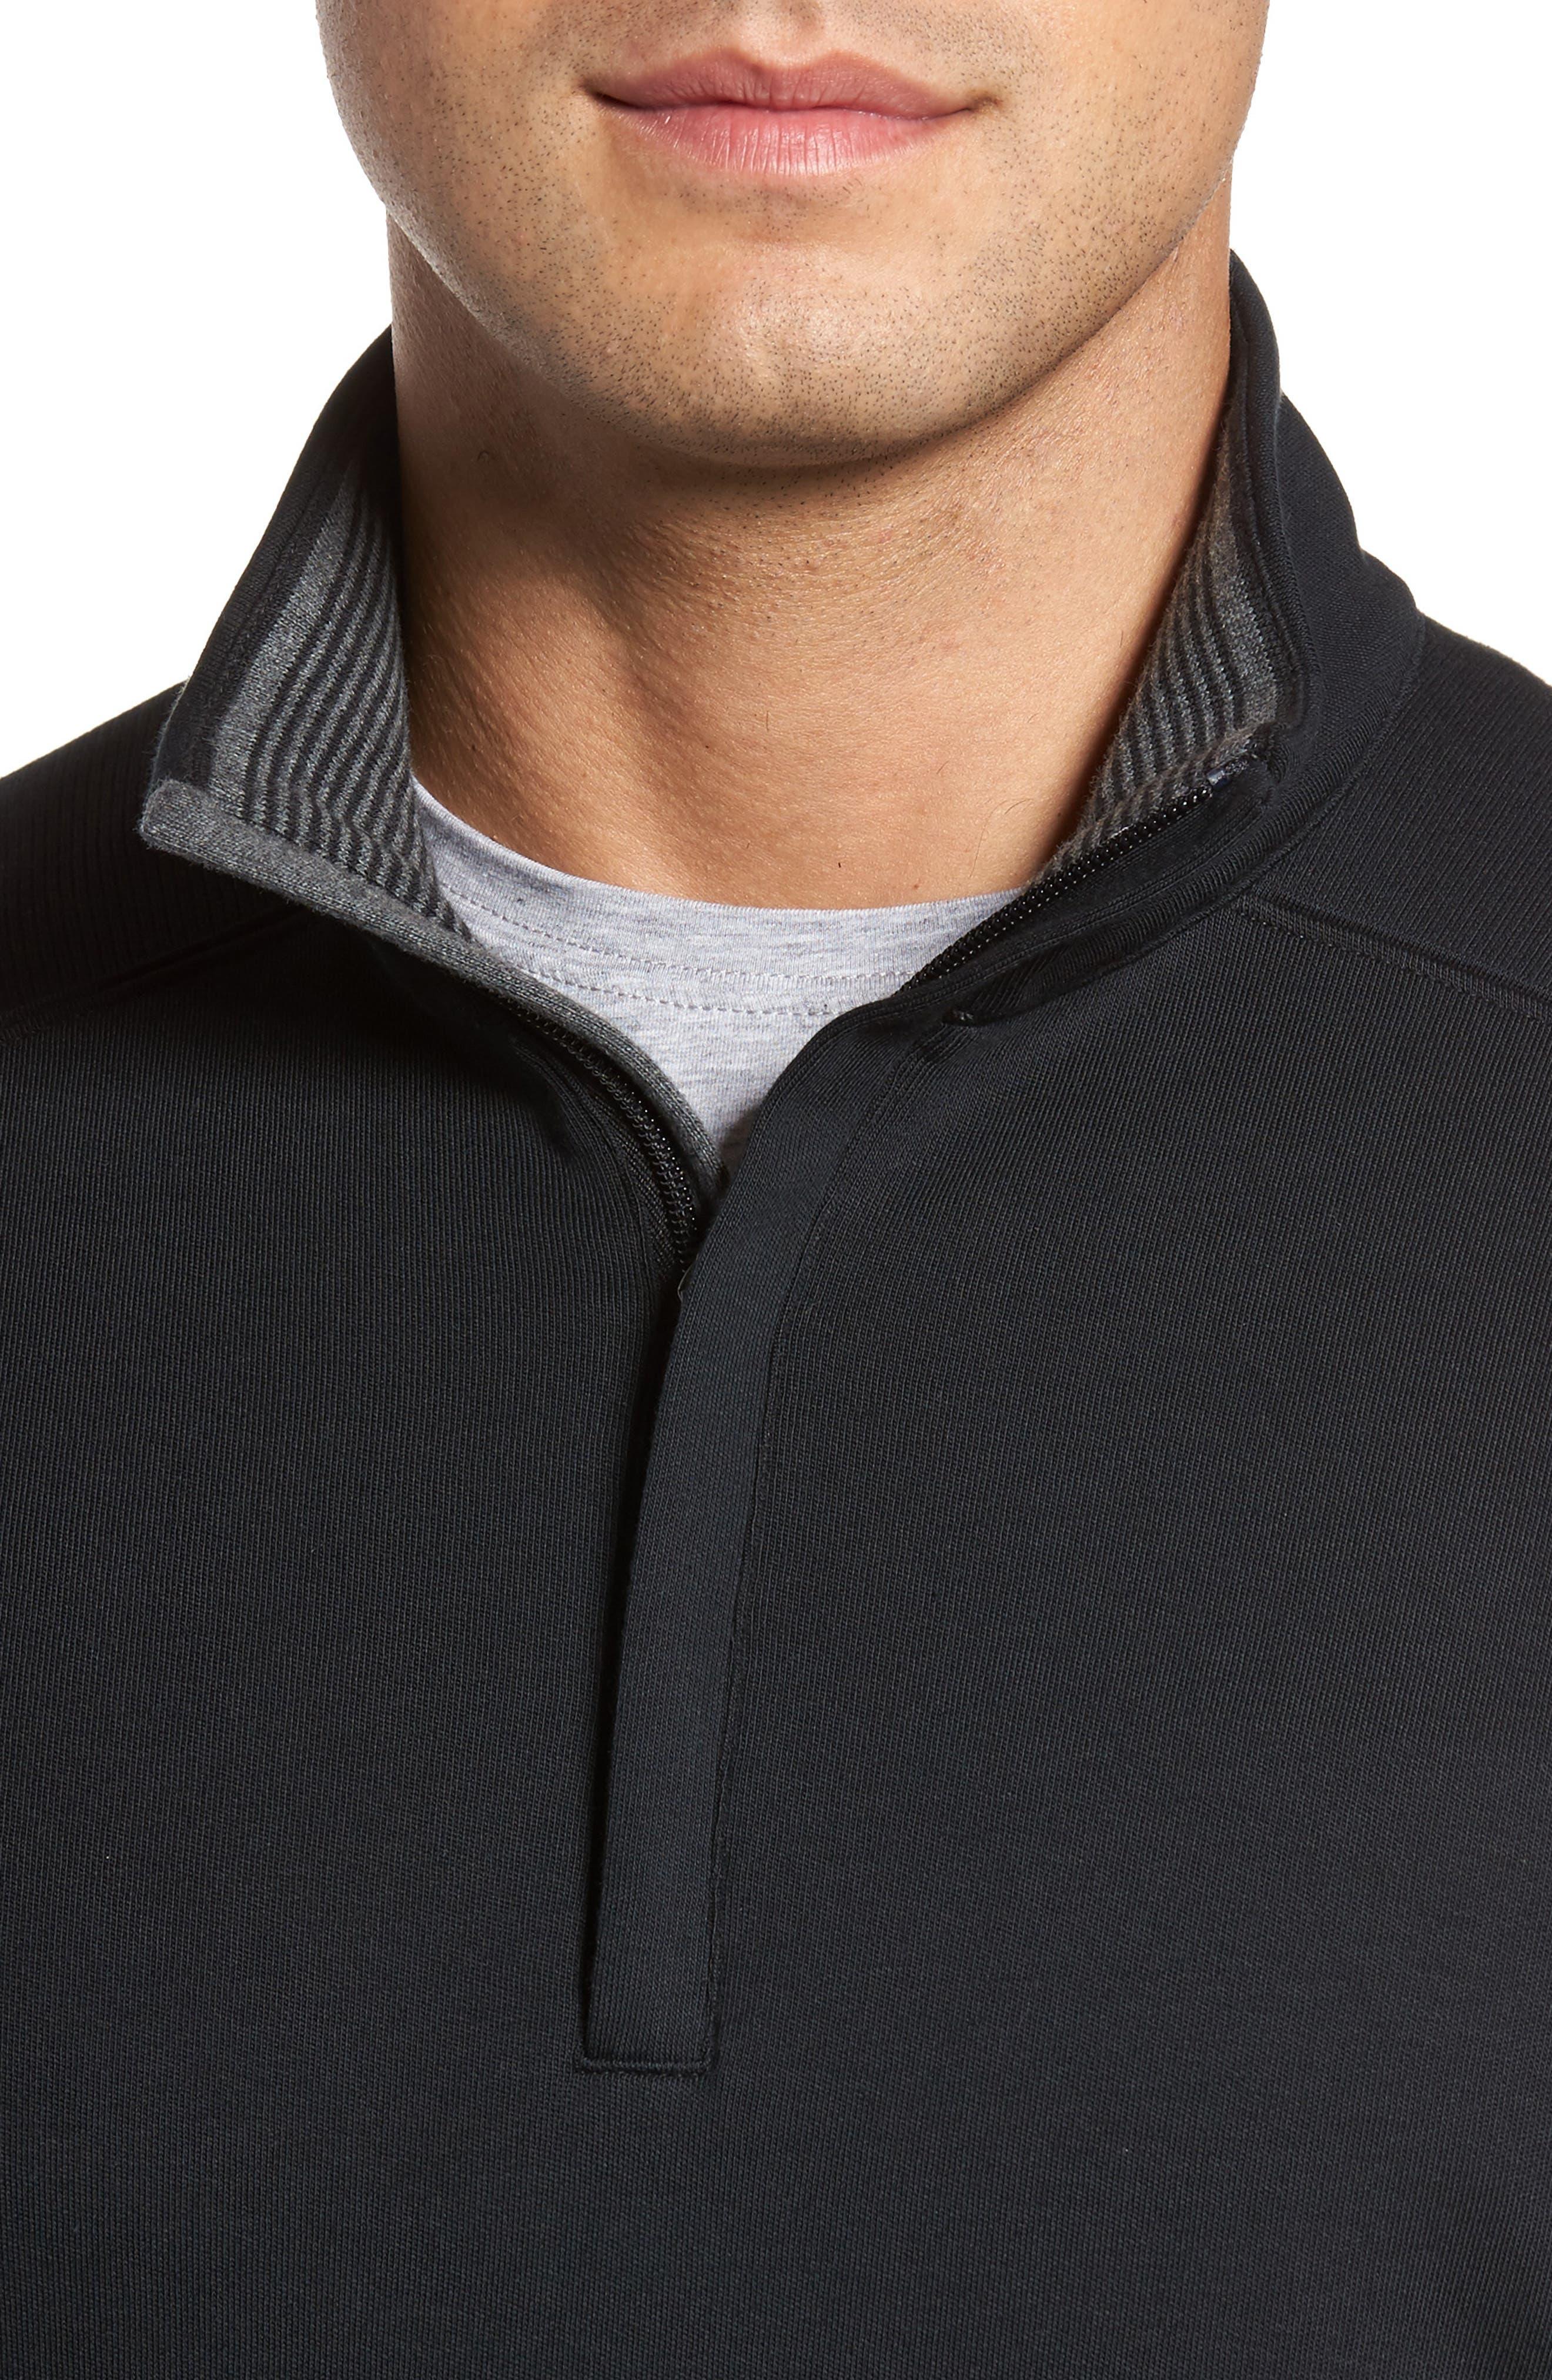 'New Leaderboard' Quarter Zip Pullover,                             Alternate thumbnail 4, color,                             BLACK